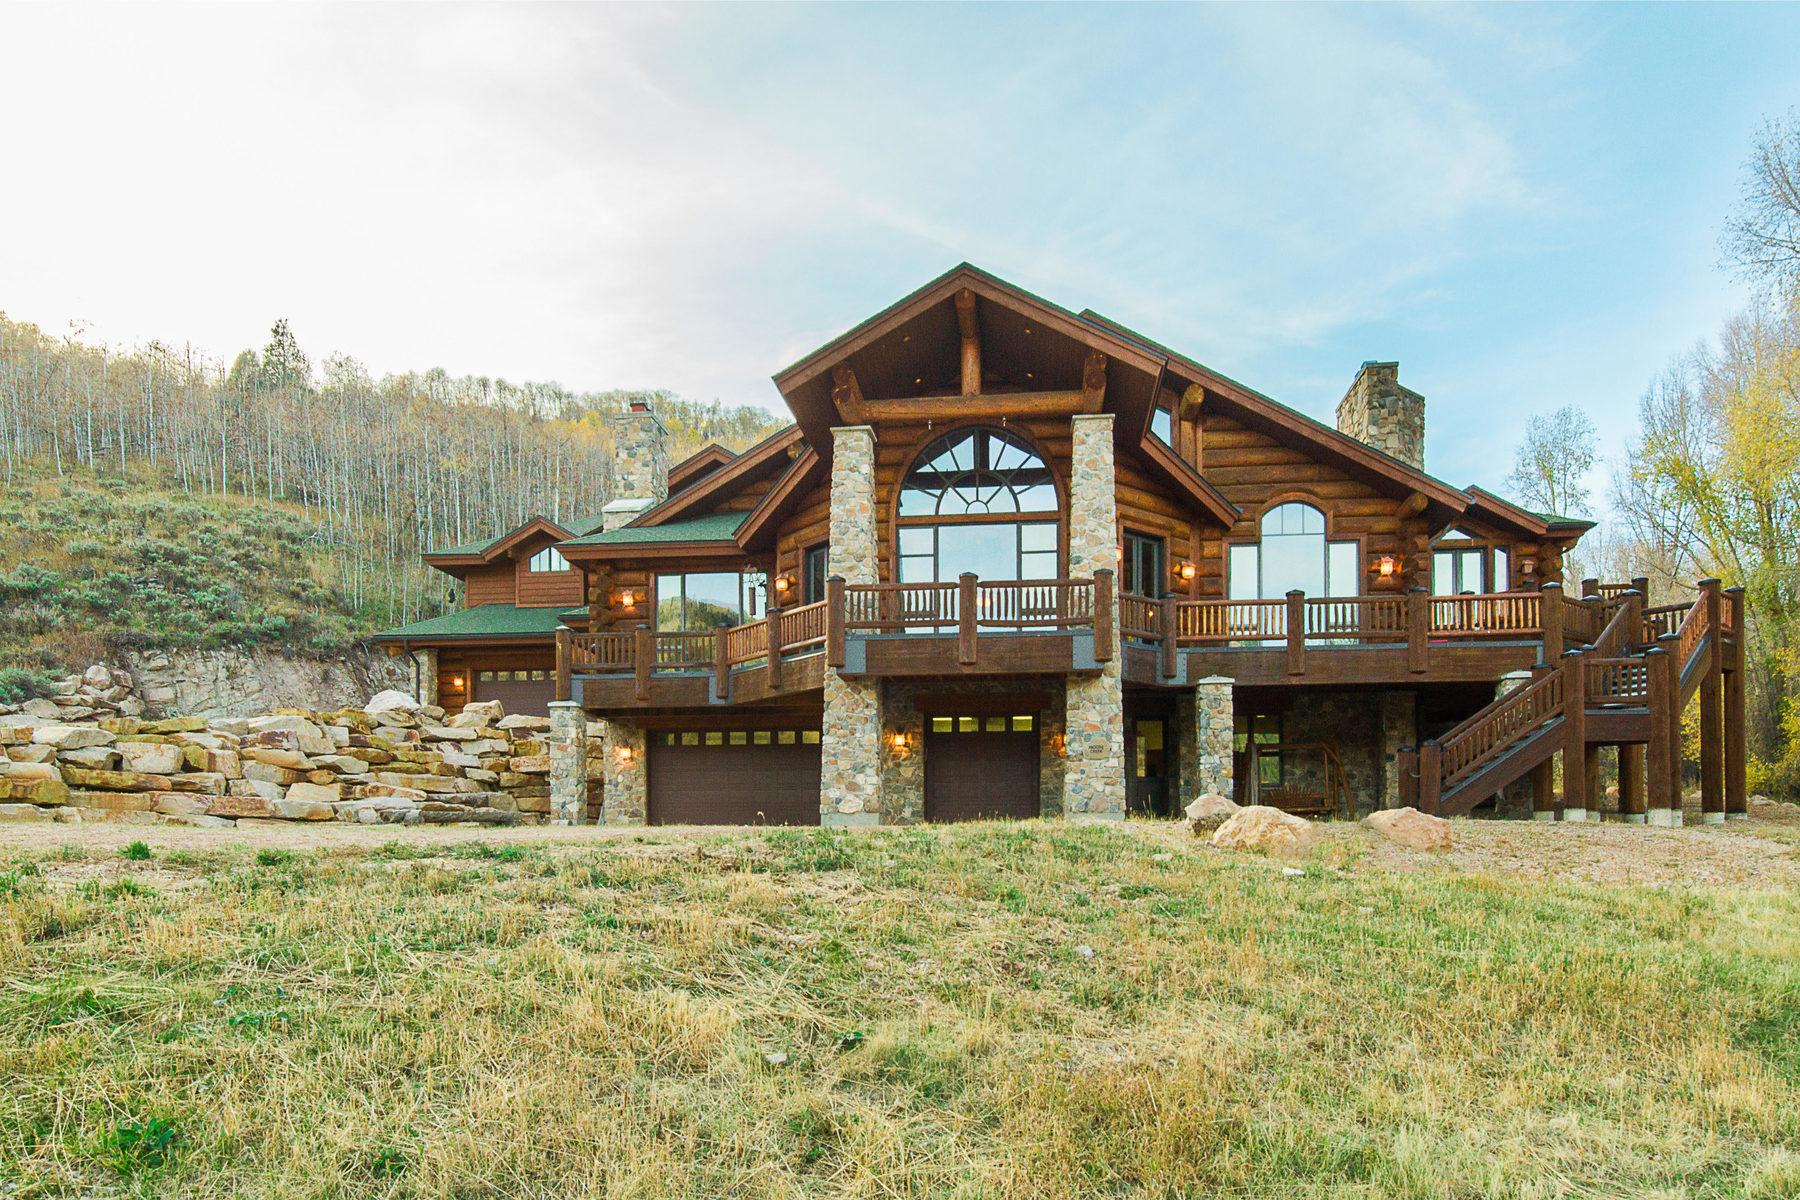 独户住宅 为 销售 在 Amazing One of a Kind Log Home 3950 E Weber Canyon Rd 奥克利, 犹他州, 84055 美国